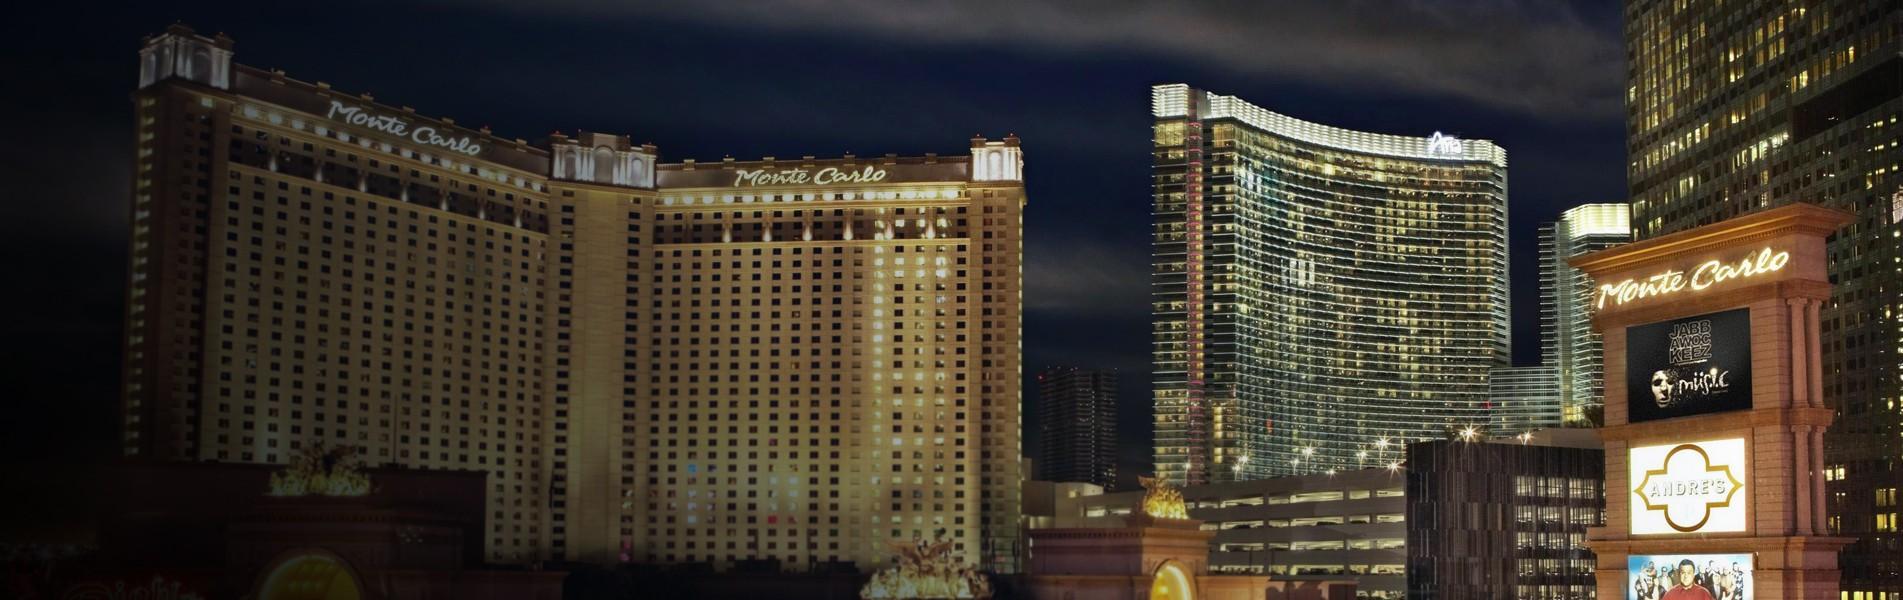 Monte Carlo Casino Las Vegas 1